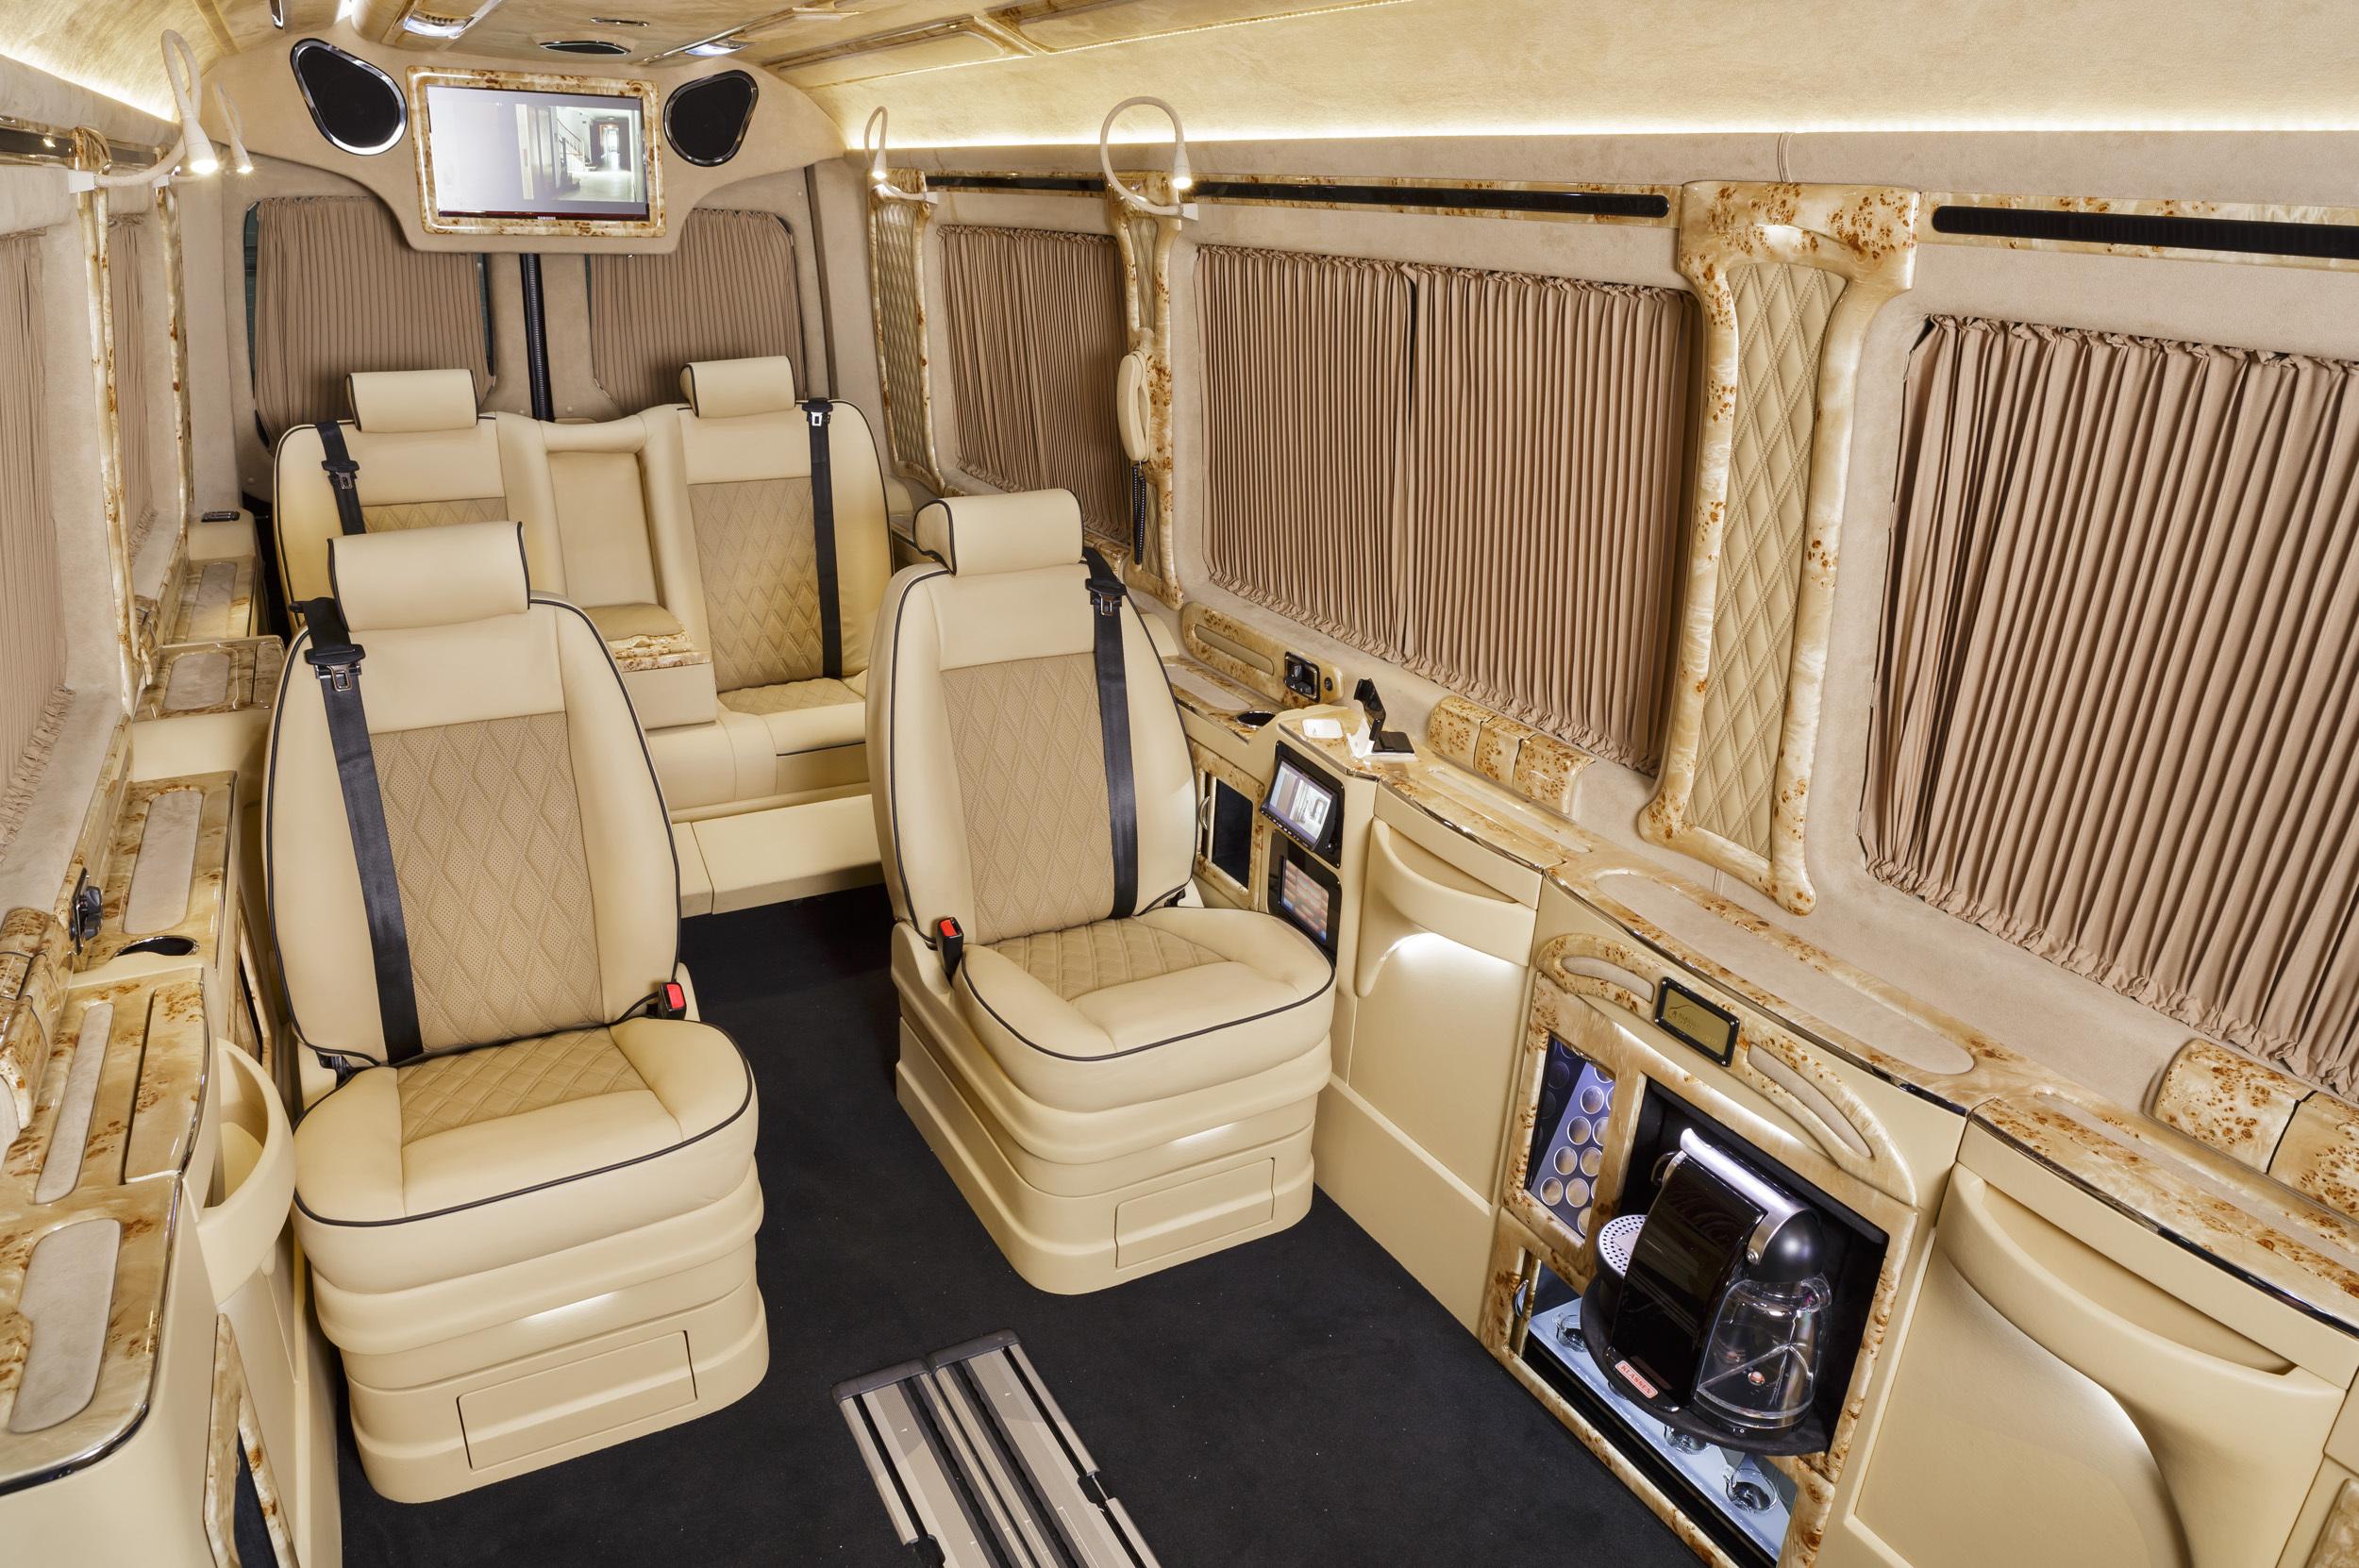 Mercedes benz sprinter interior full hd wallpaper and for Mercedes benz van interior